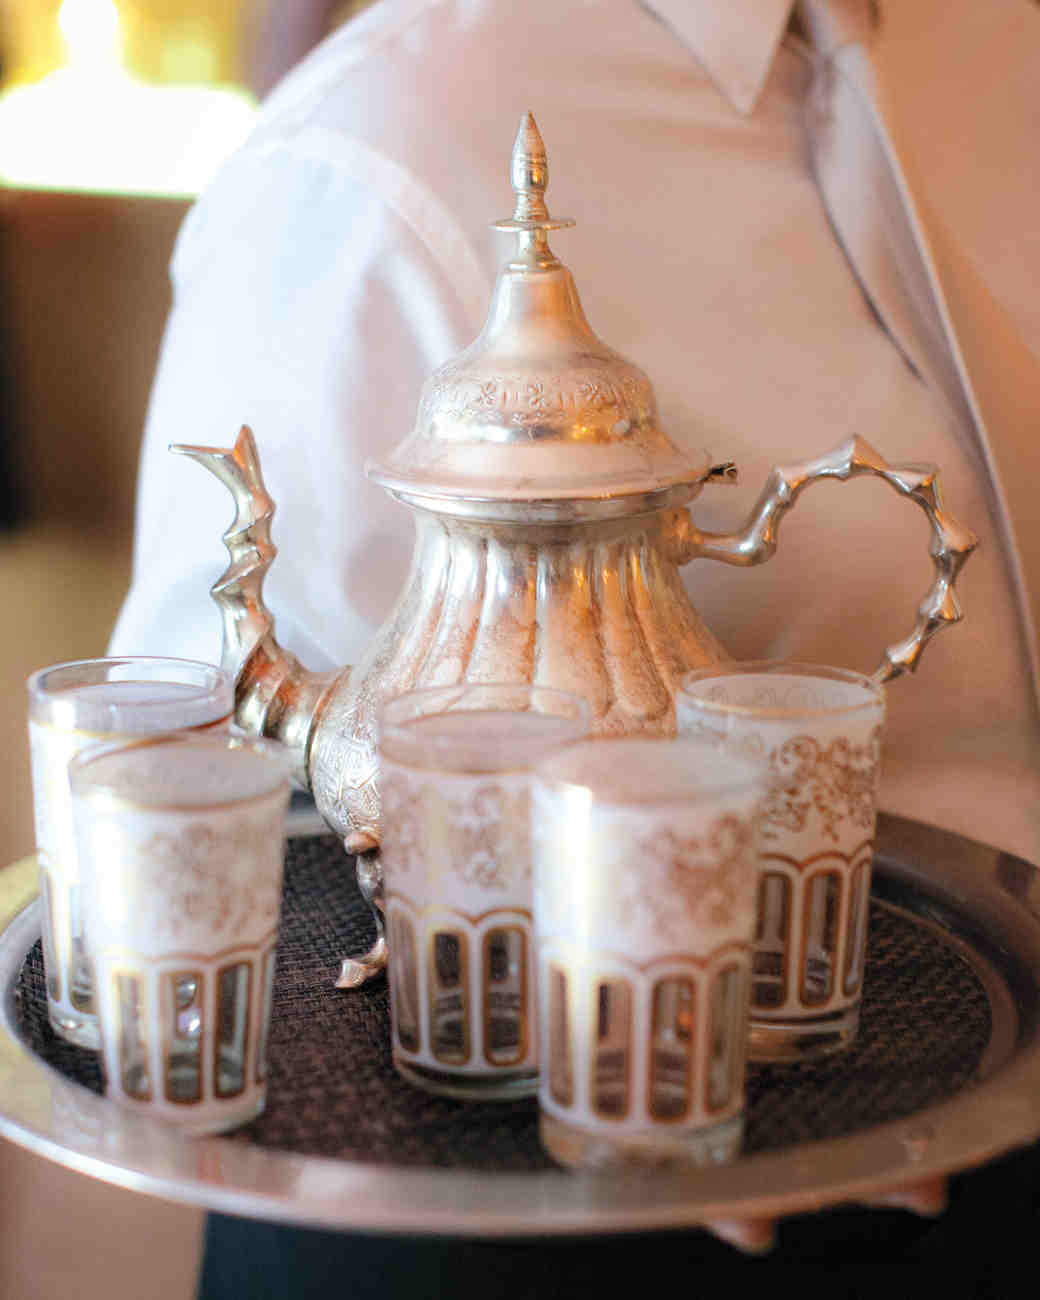 moroccan-mint-tea-mwds109981.jpg